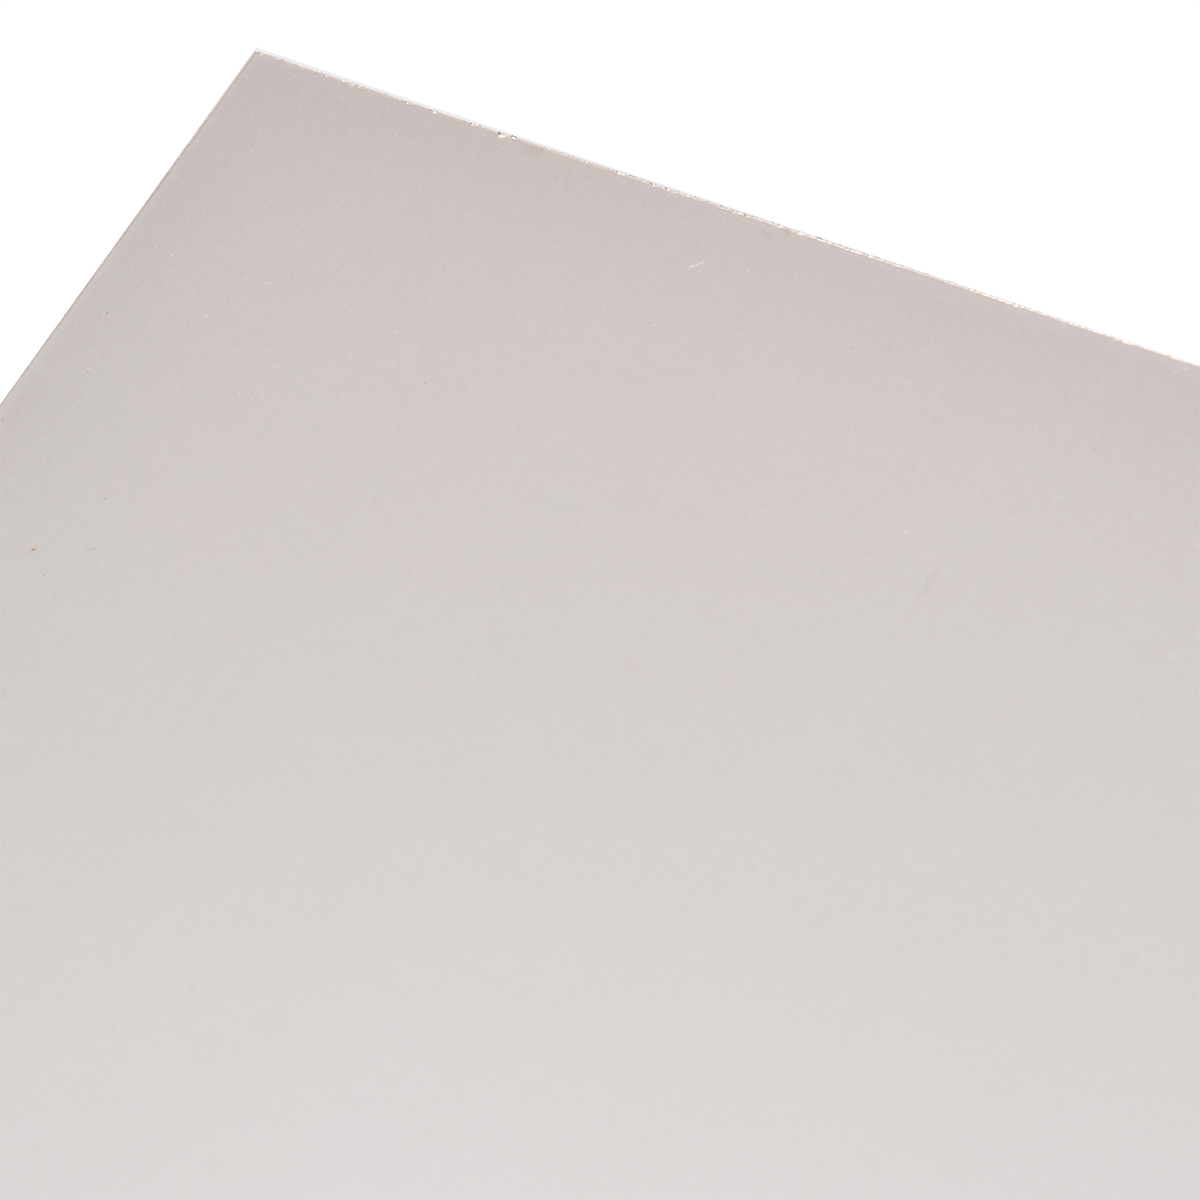 0.3mm x 125mm x 100mm 99.5/% Pure Graphite Sheet Foil